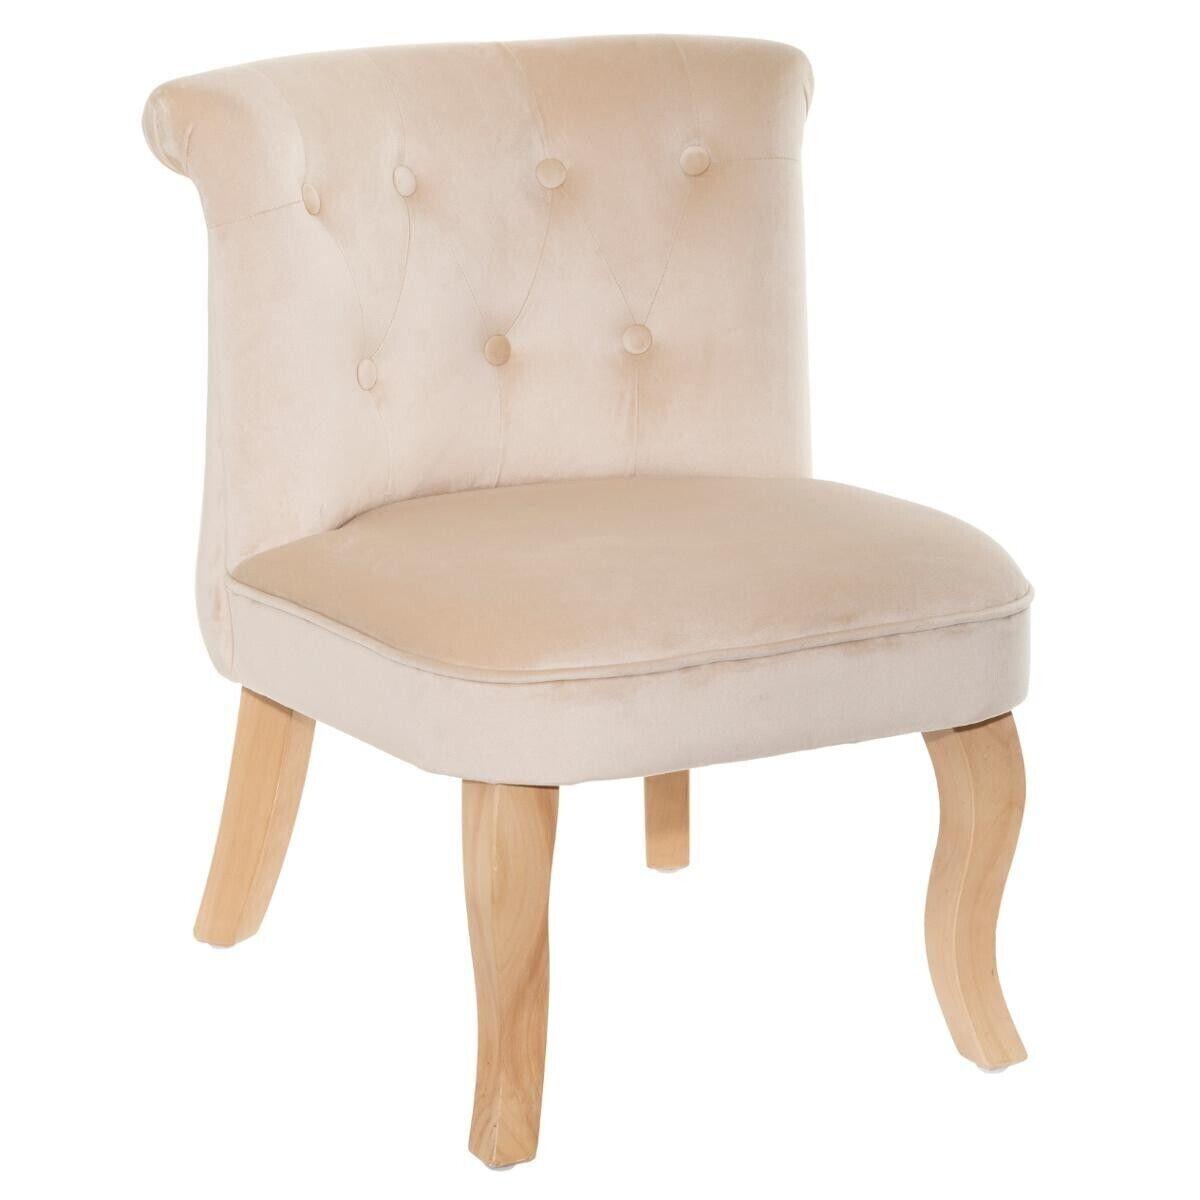 Atmosphera Petit fauteuil